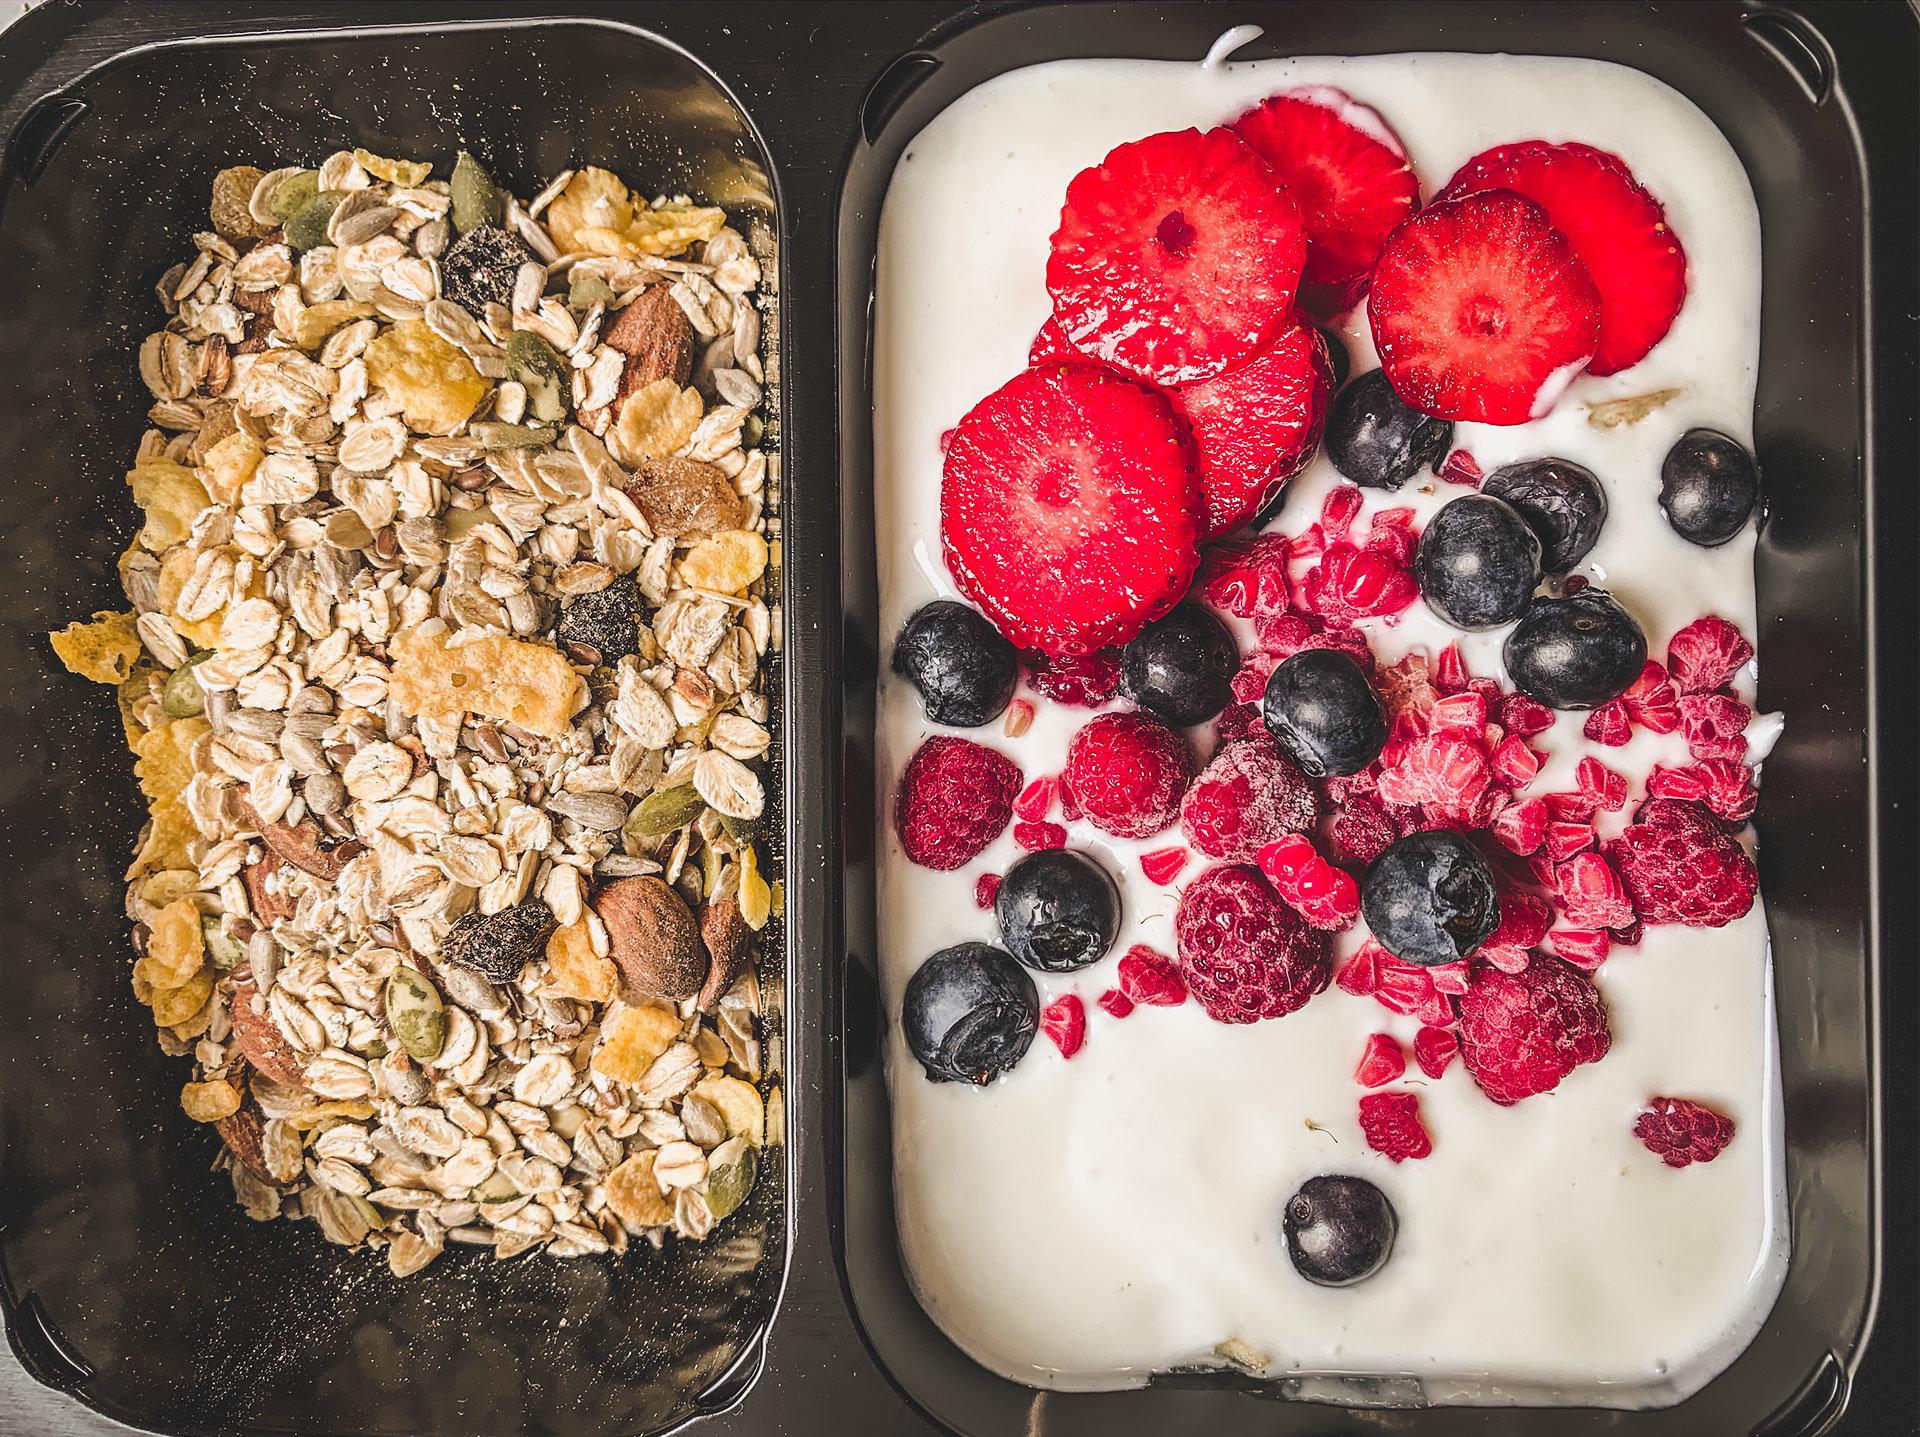 Obrazek Dieta bez glutenu na 5 dni 1200 kalorii